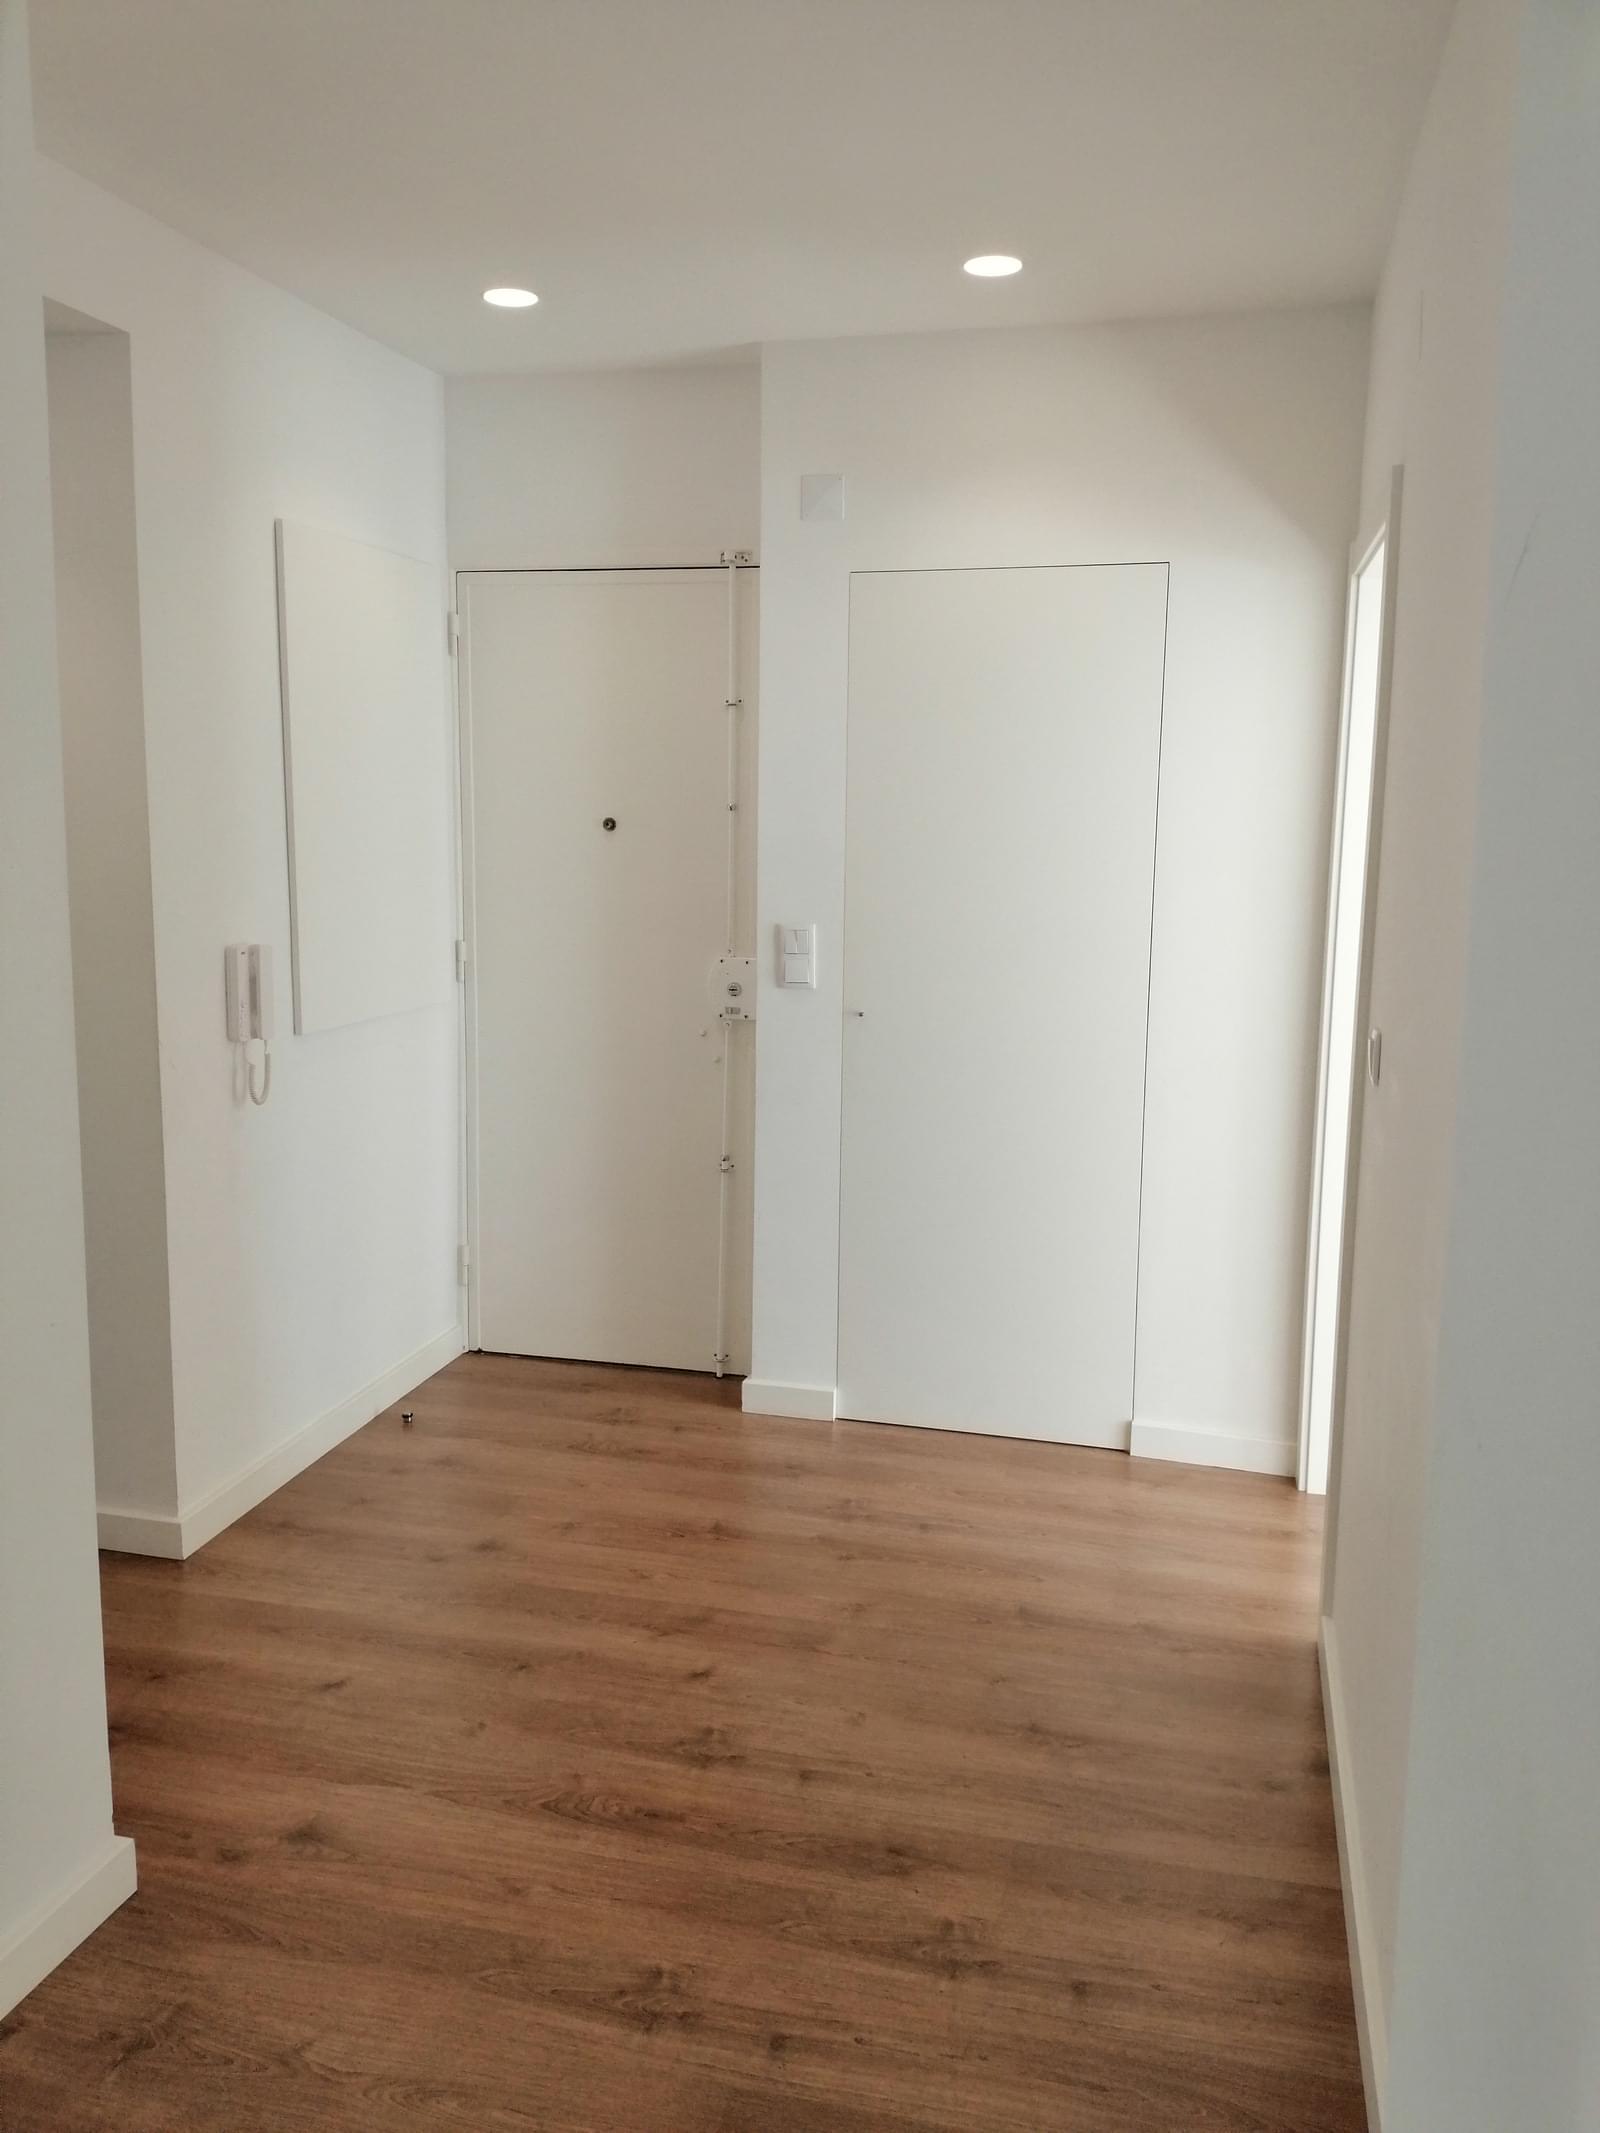 pf18996-apartamento-t3-lisboa-410fcf39-76b3-46f7-ac1b-6543c70265b1